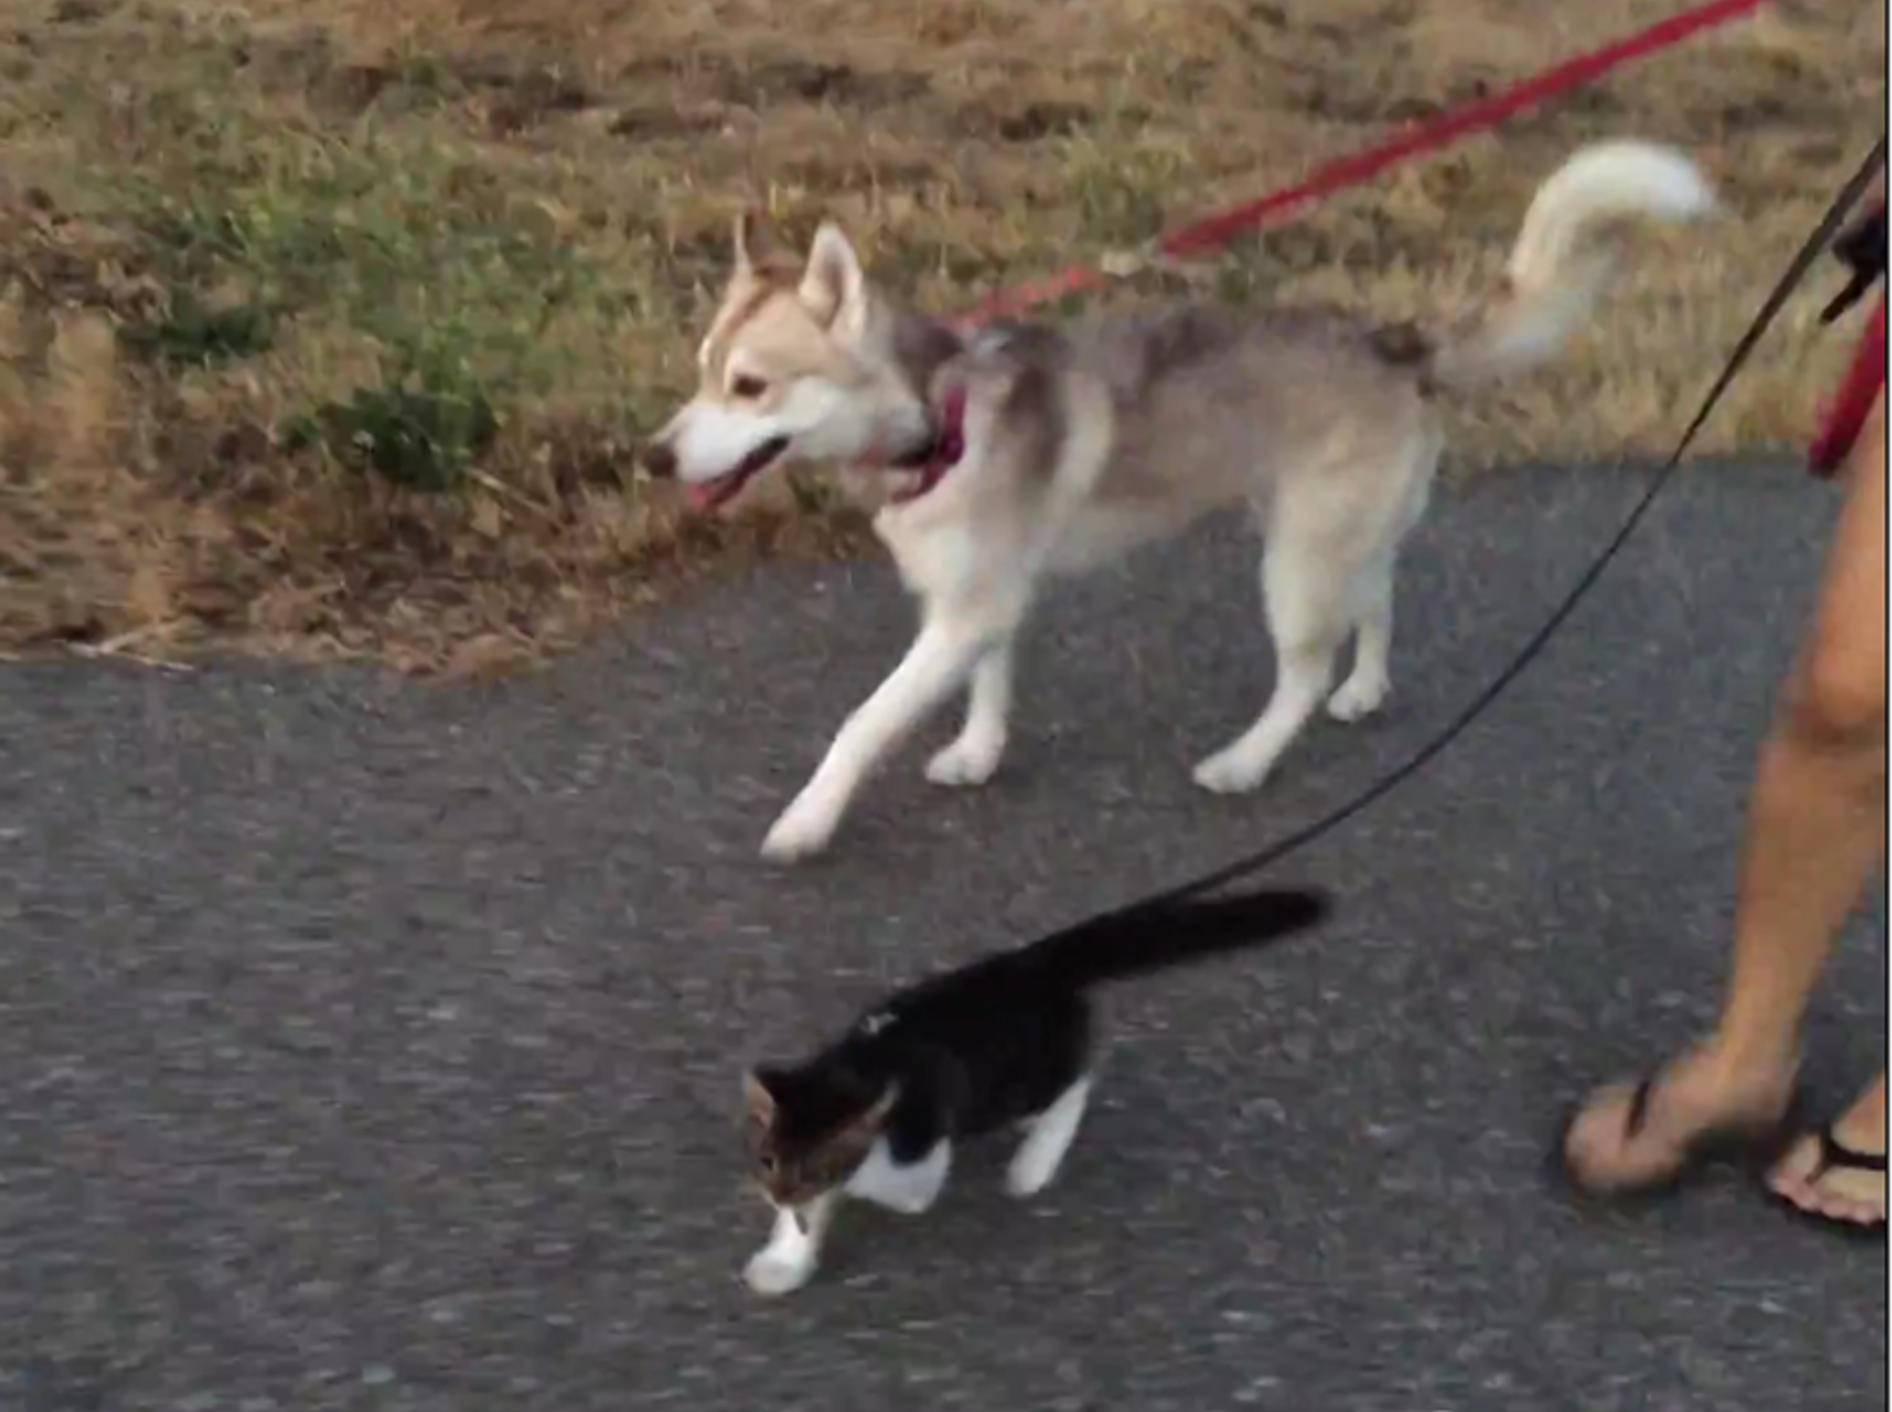 Katze Rosie und Husky Lilo gehen Gassi – YouTube / Lilothehusky